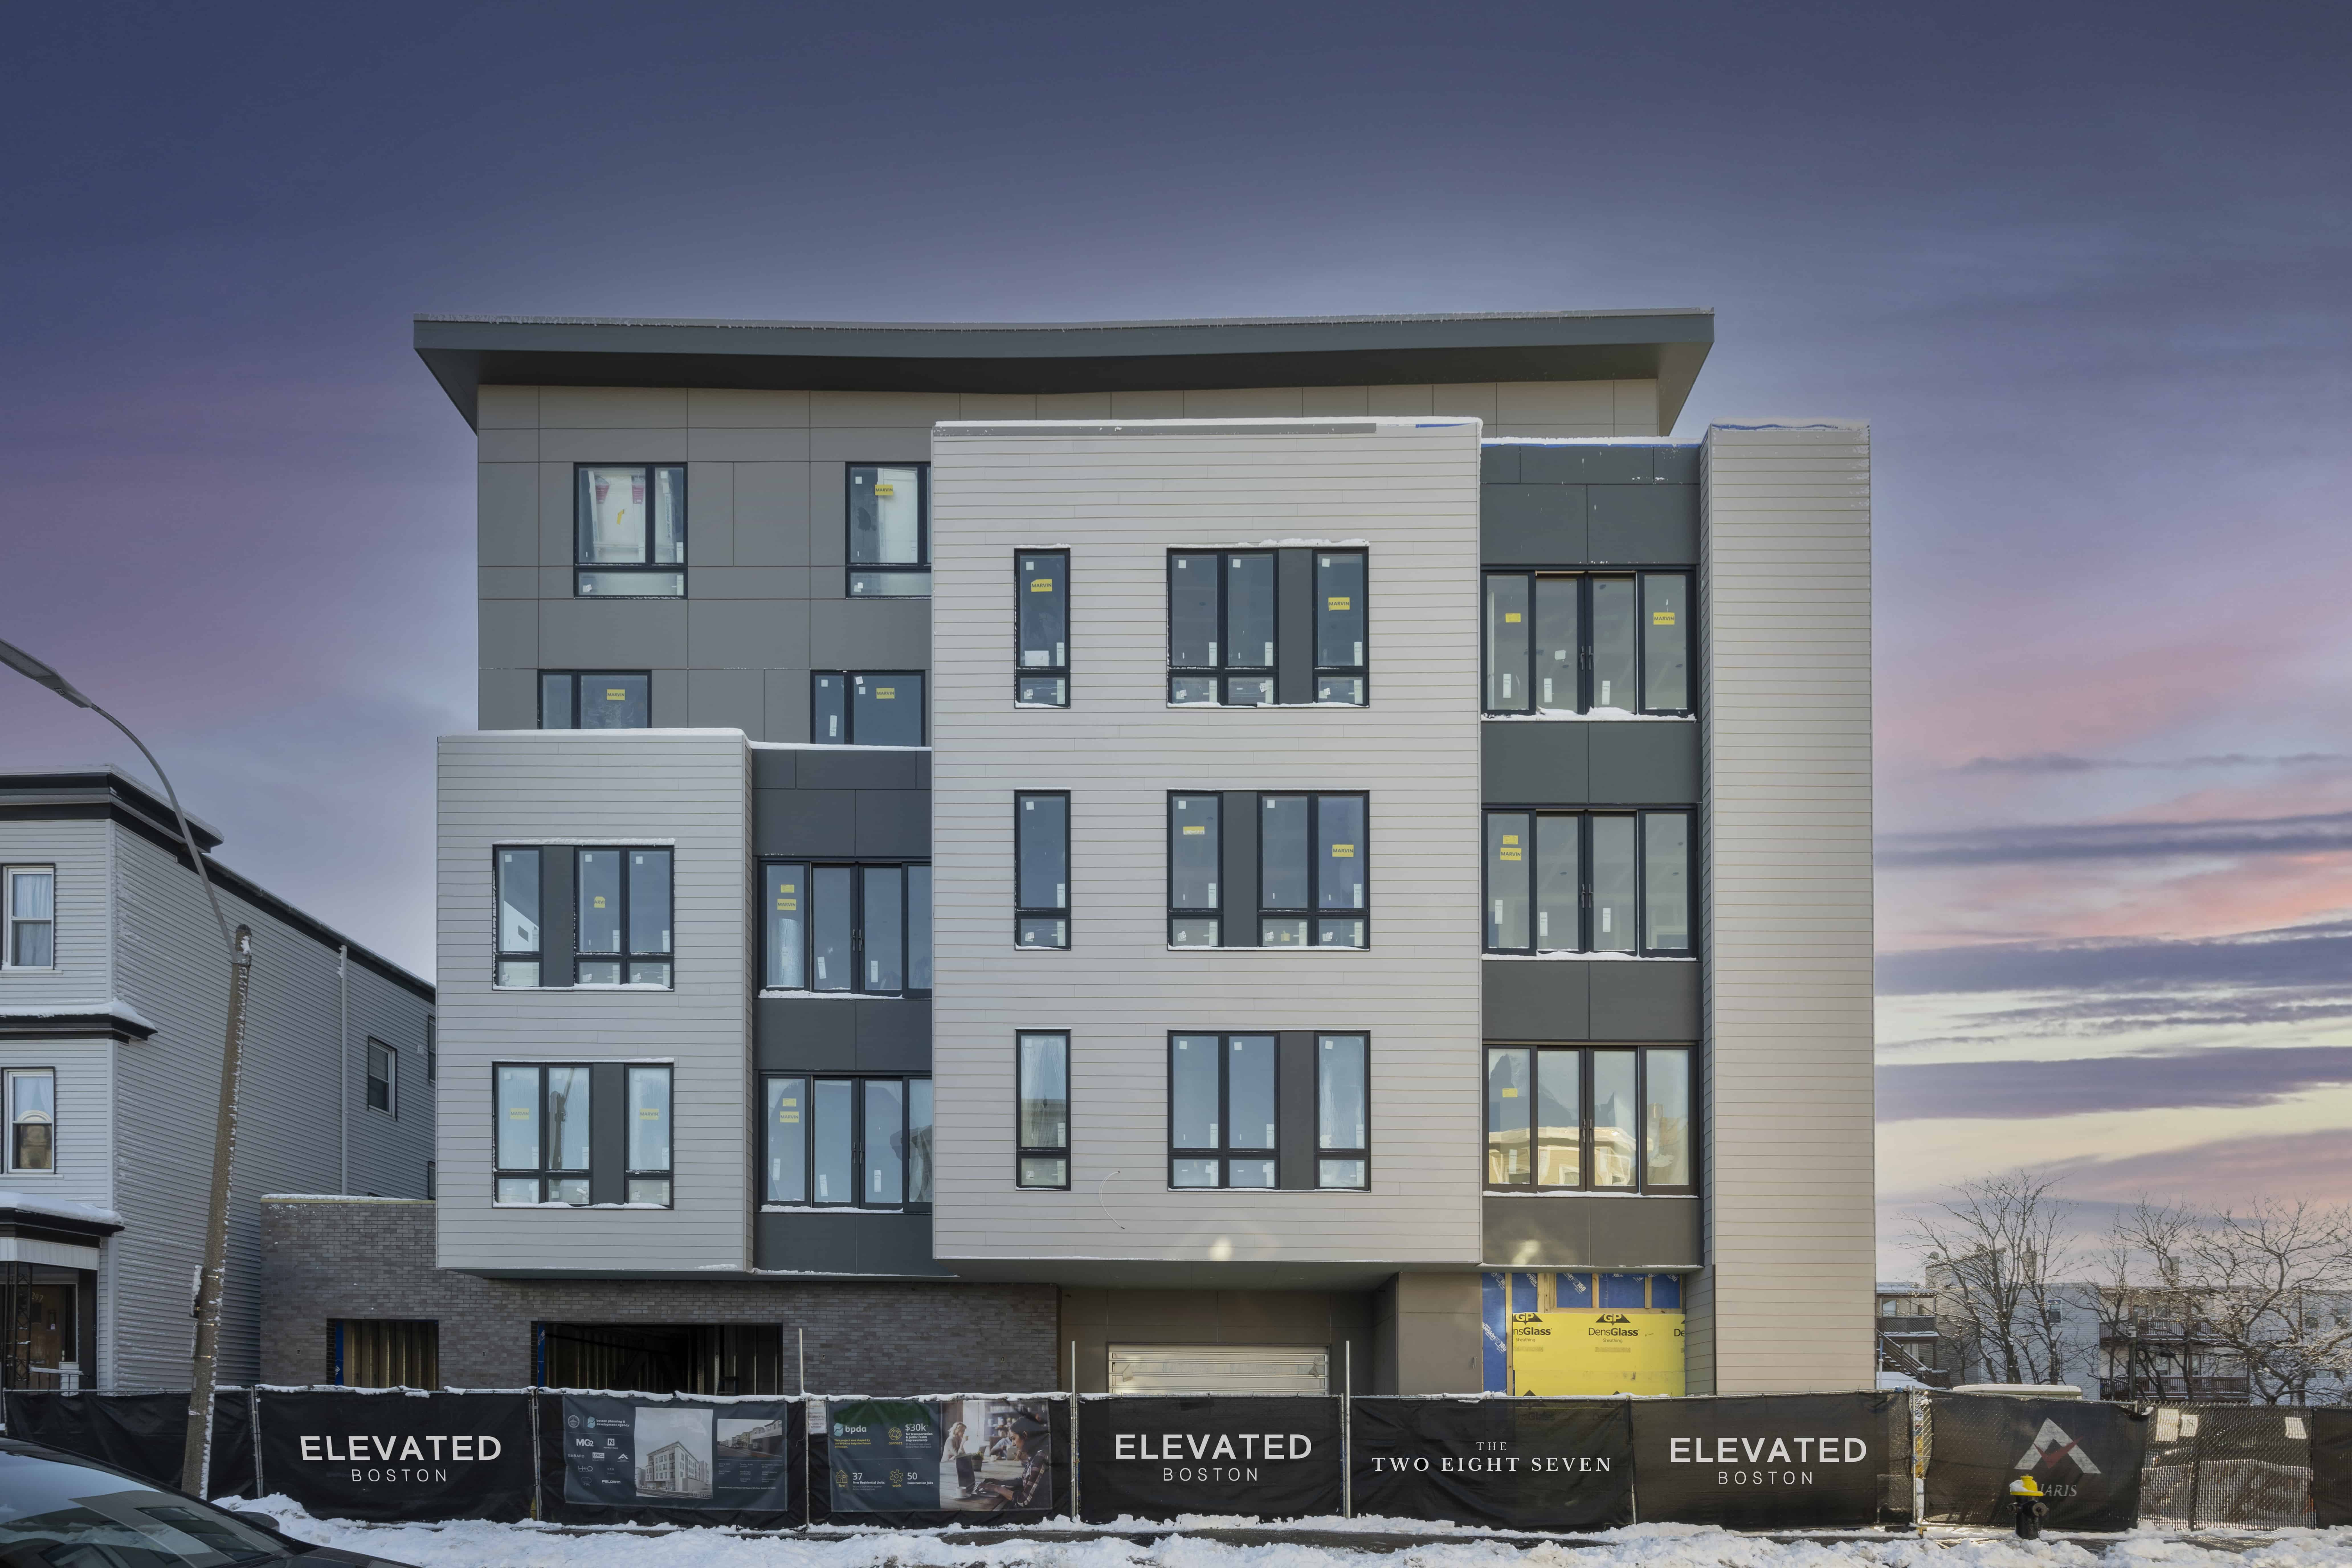 The Two Eight Seven | 287 Maverick St | East Boston Luxury Condos | Elevated Boston